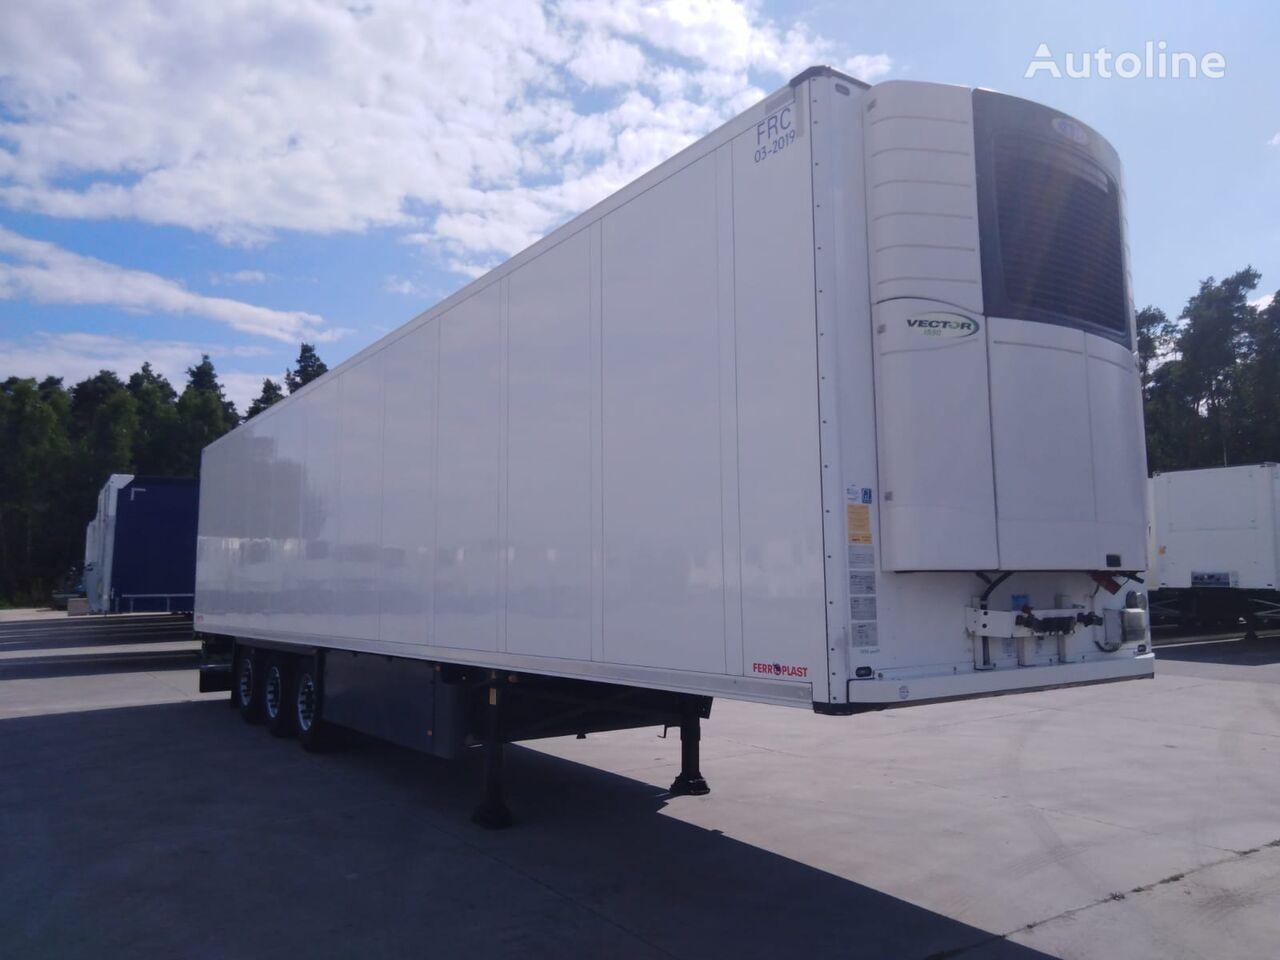 SCHMITZ CARGOBULL Doppelstock - podwójny załadunek z Carrier Vector 1550 refrigerated semi-trailer